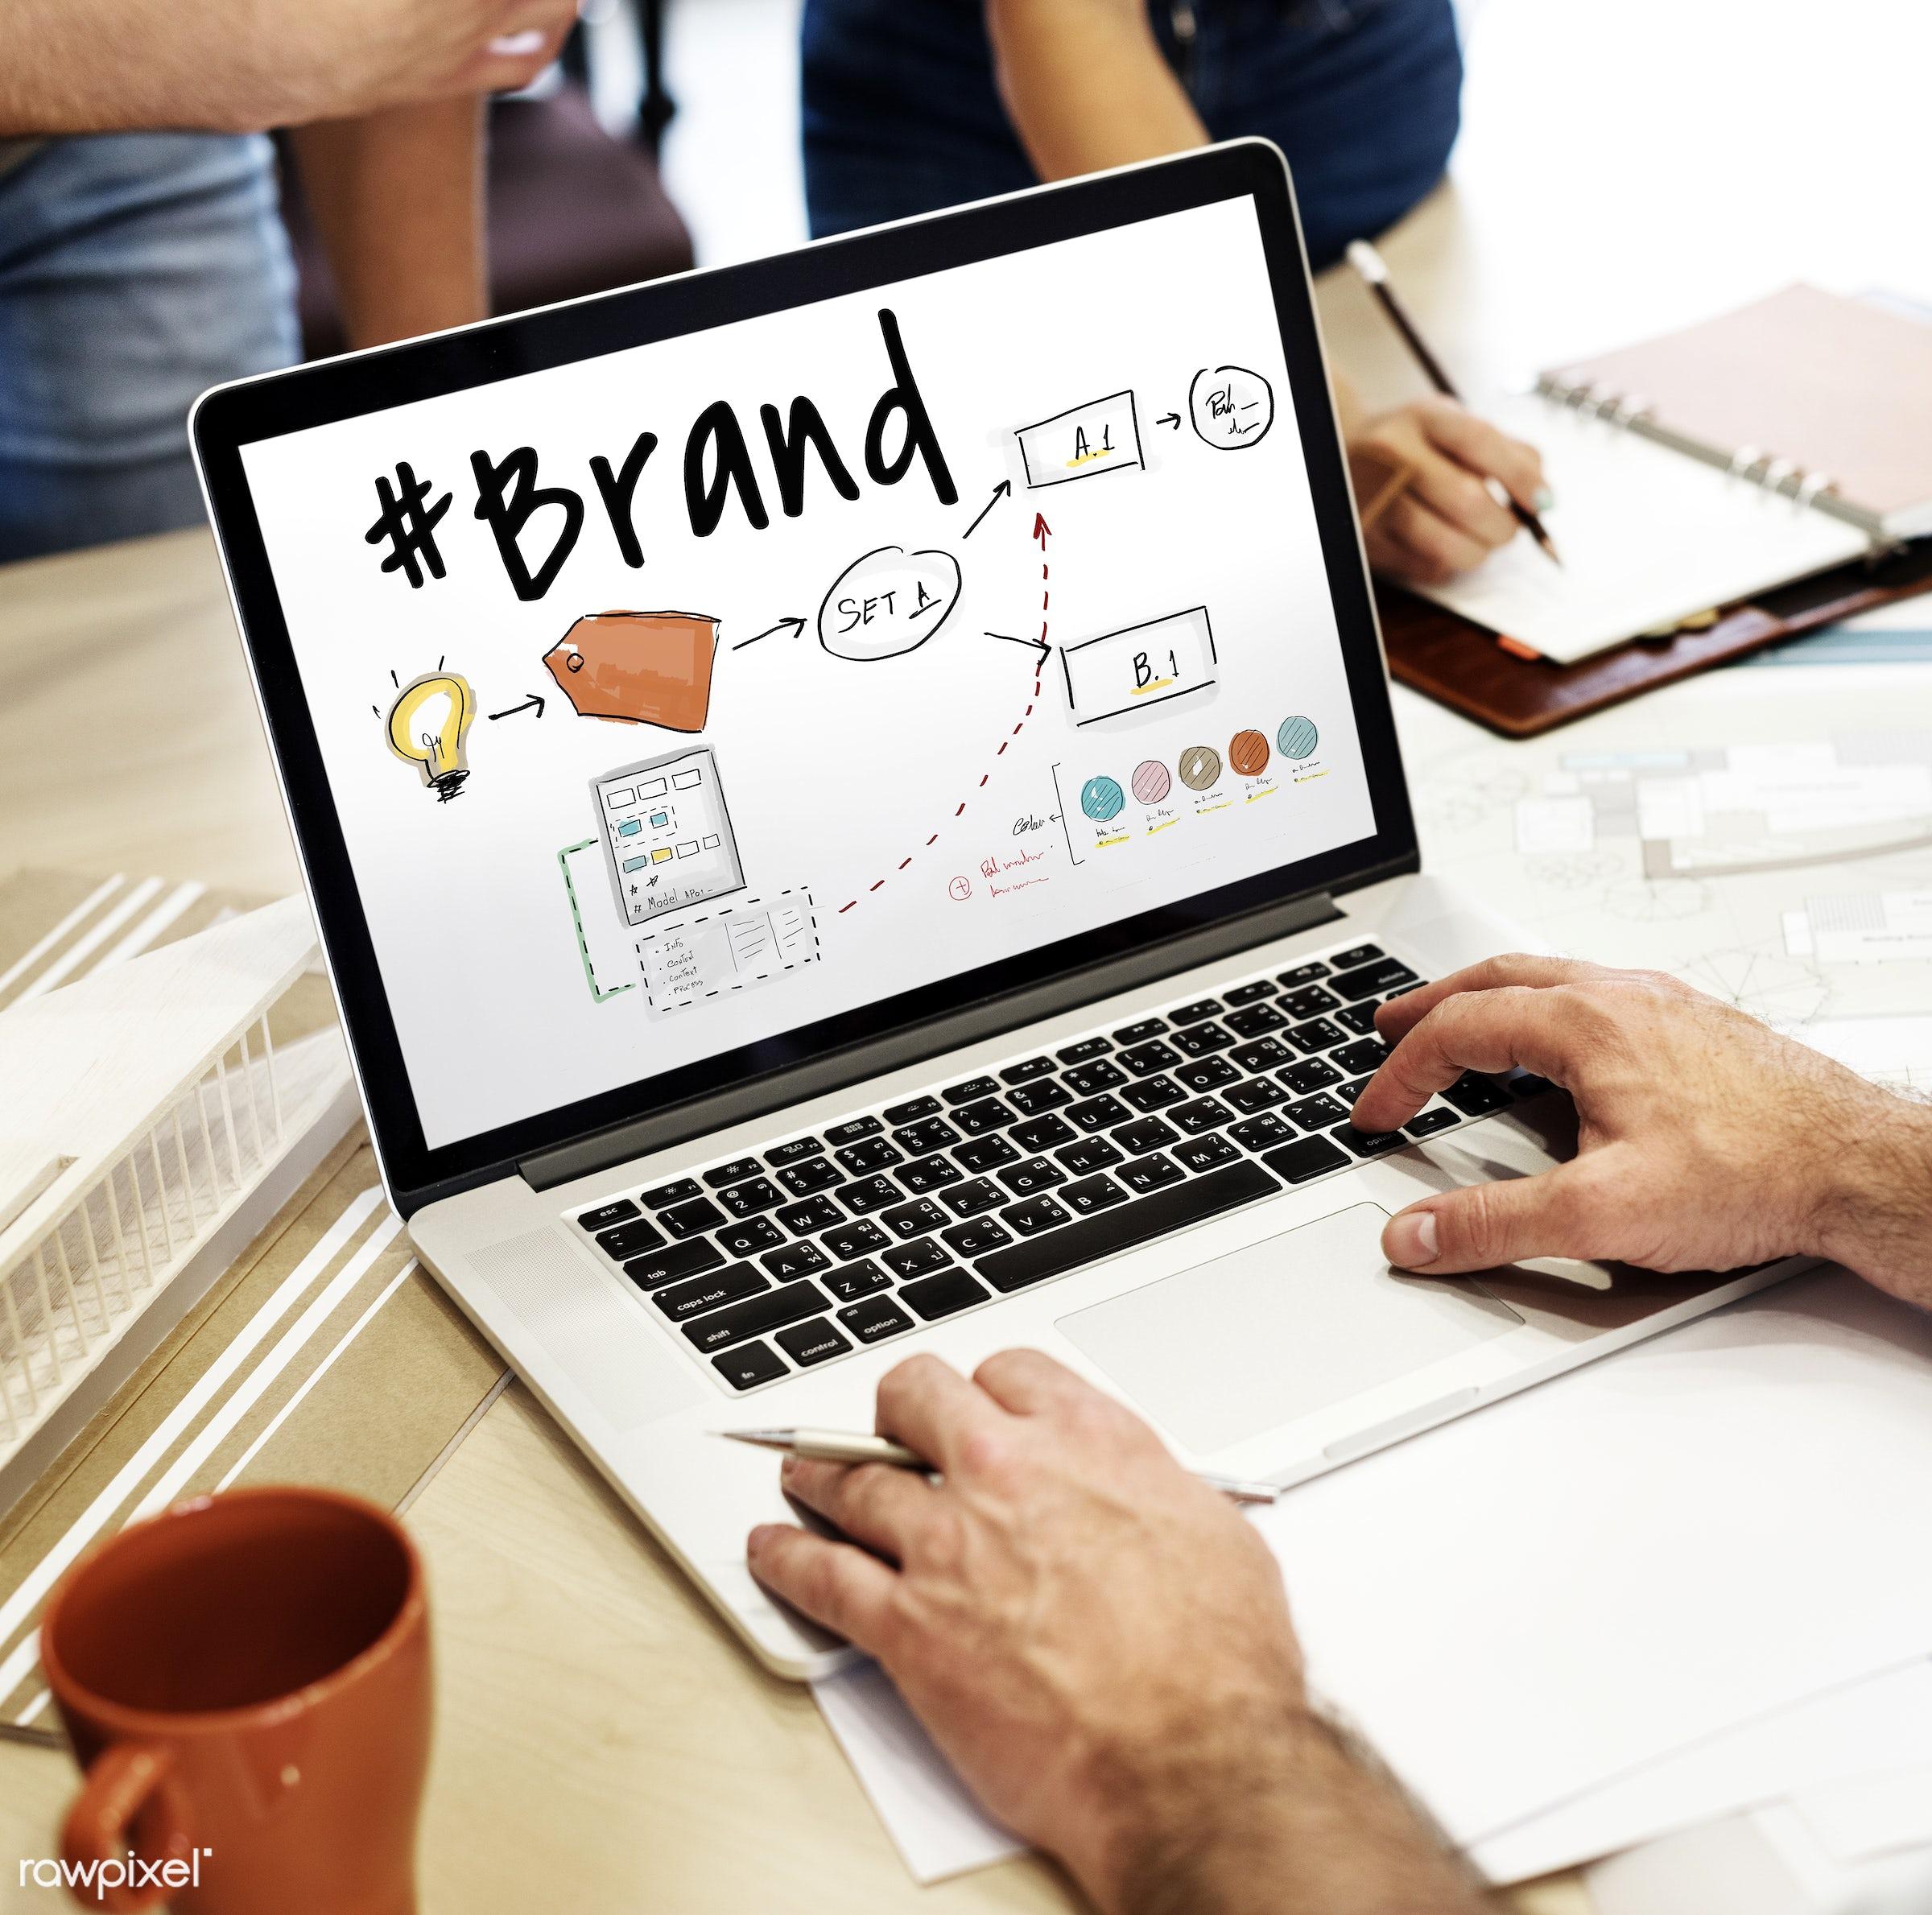 brand, architect, architecture, art, blueprint, brainstorm, business, chart, coffee, coffee cup, concept, conceptualize,...